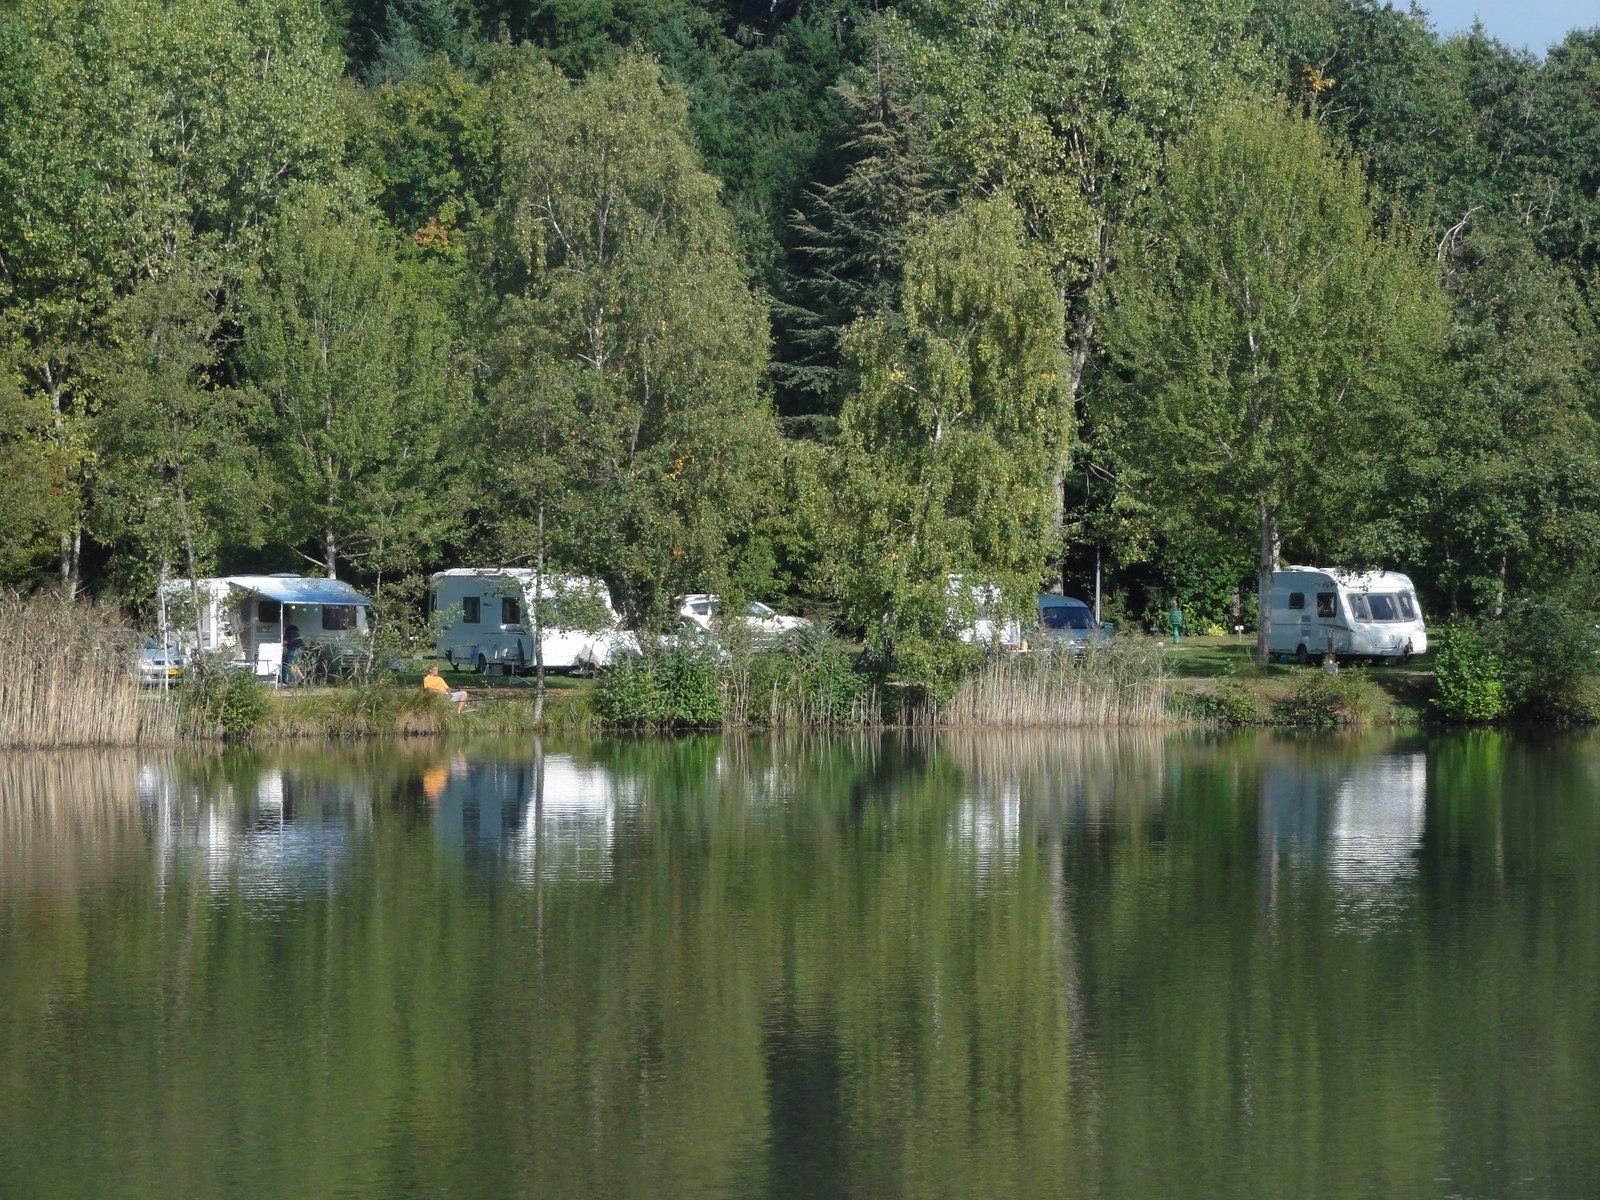 Frankrijk-NouanleFuzelier-Camping%20La%20Grande%20Sologne-ExtraLarge Campings Frankrijk